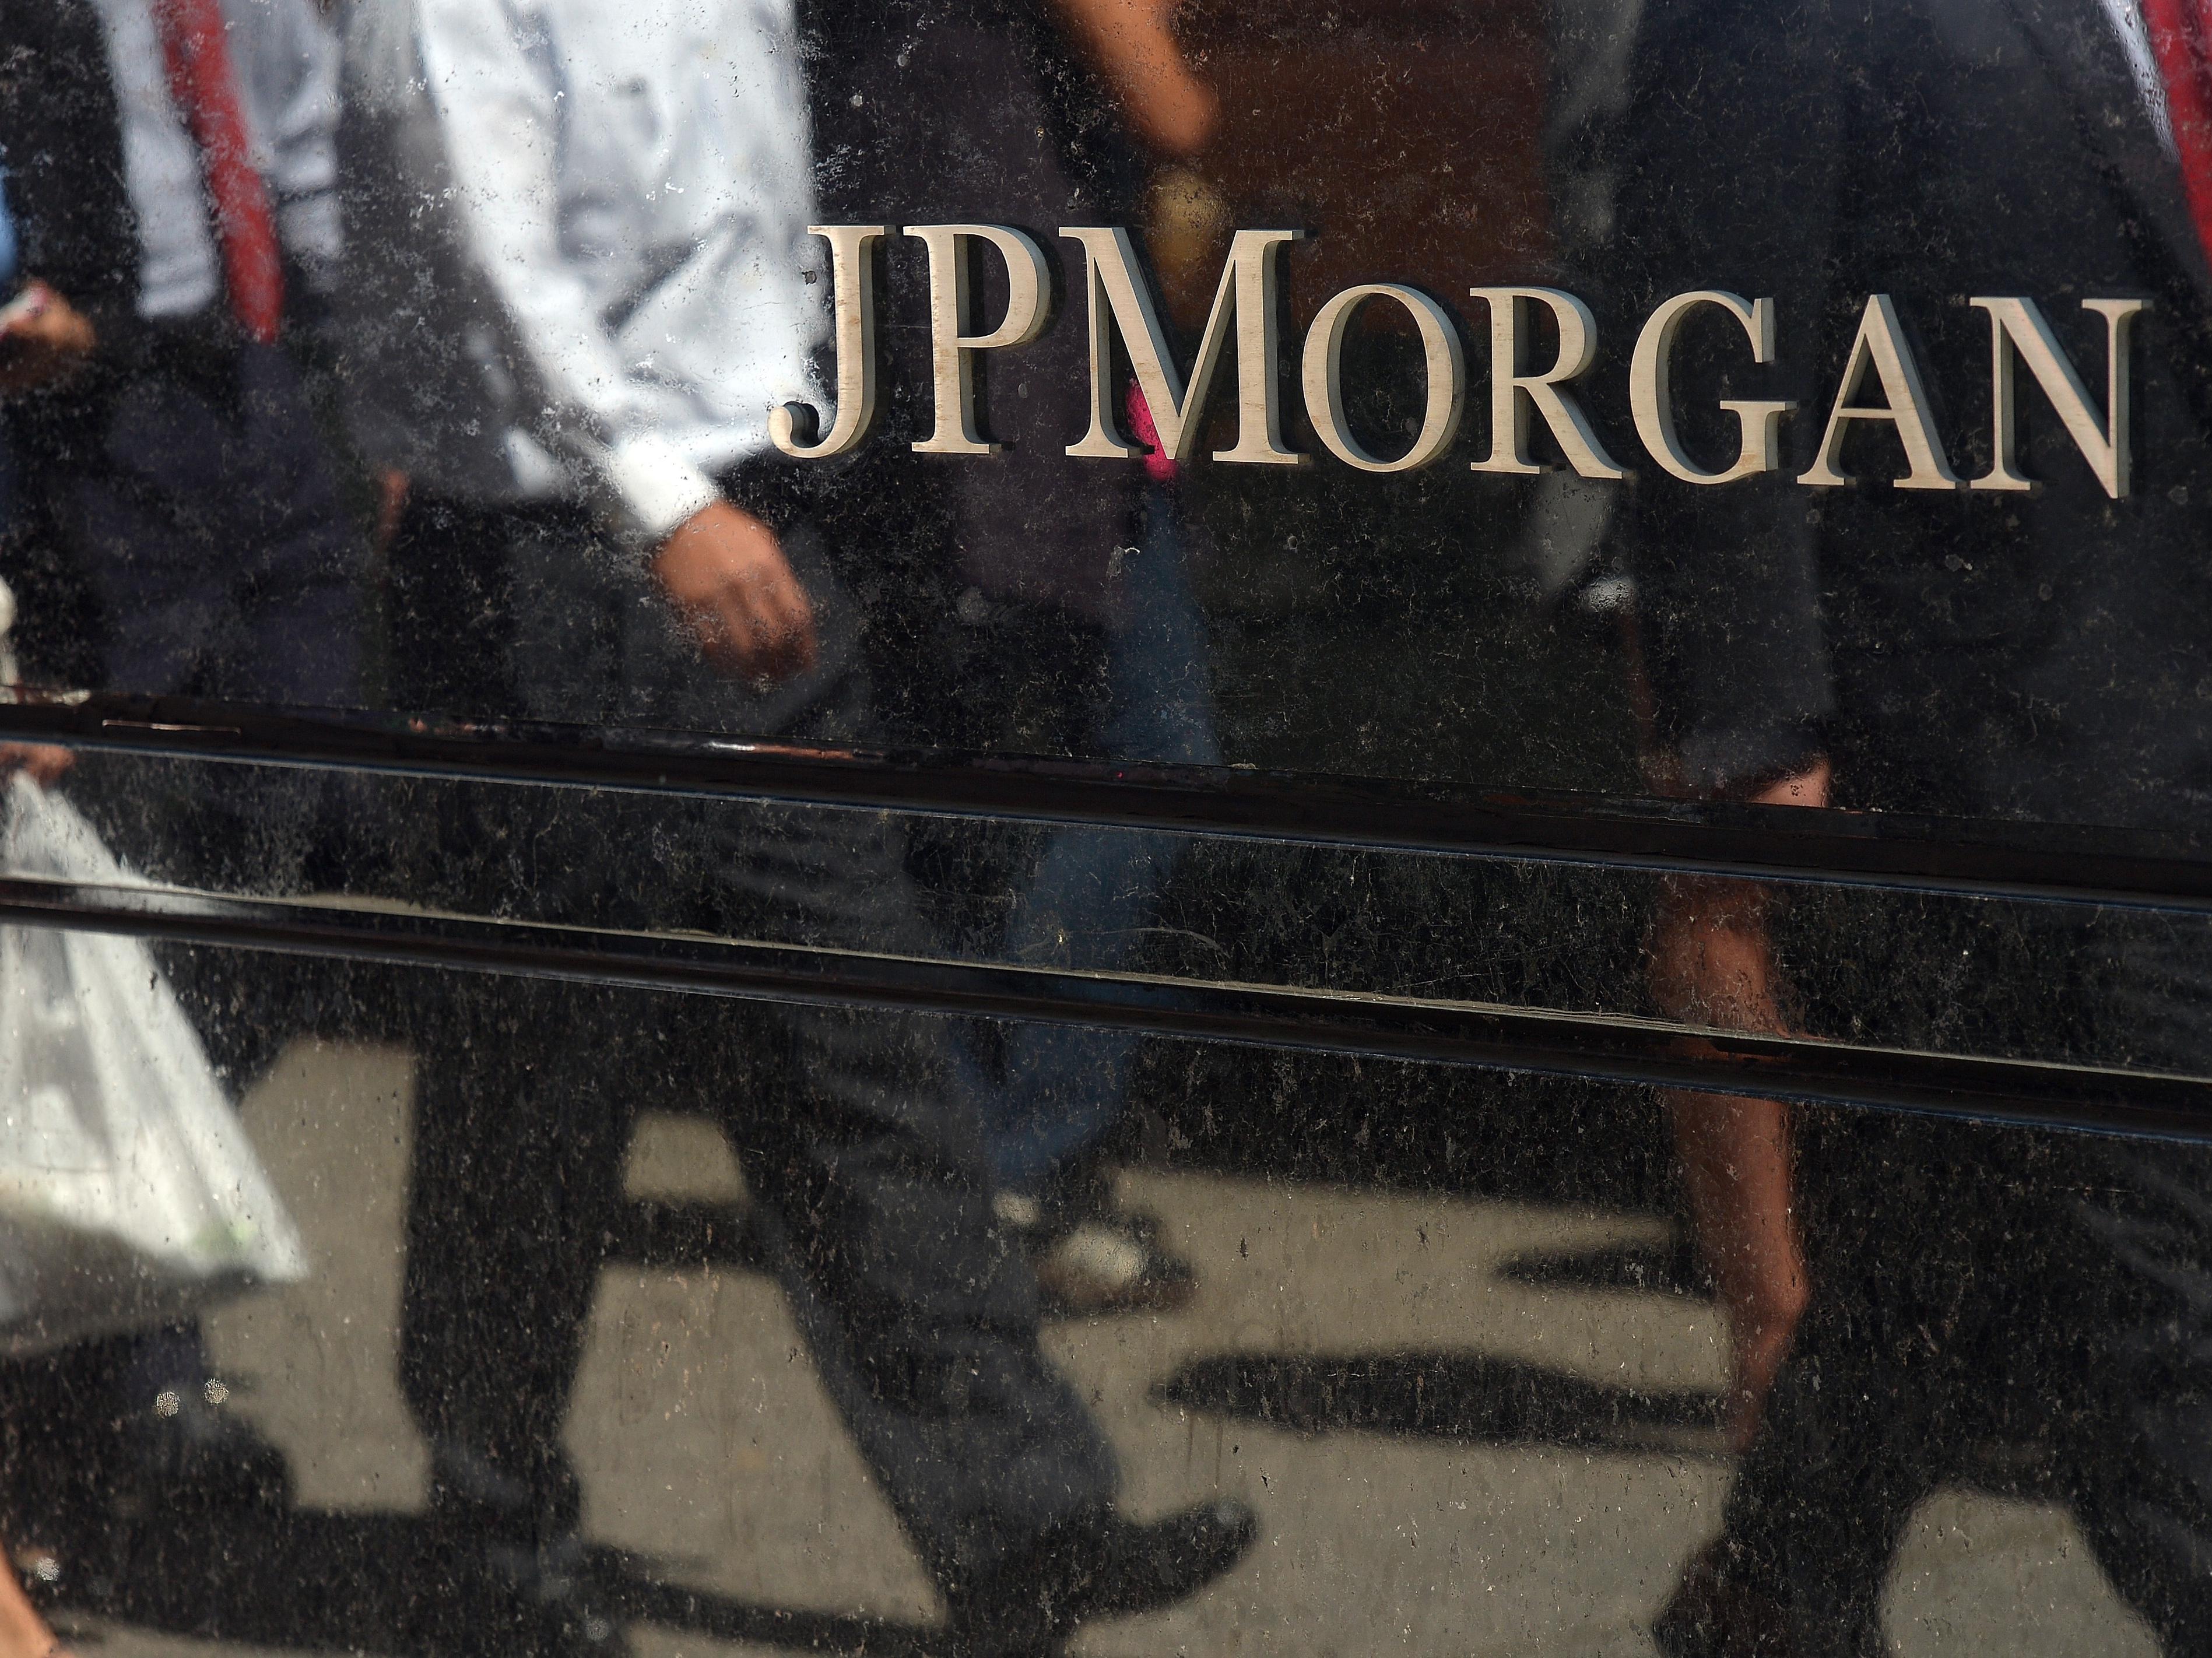 JPMorgan Says It Broke No Law. So Why Pay The $13 Billion?